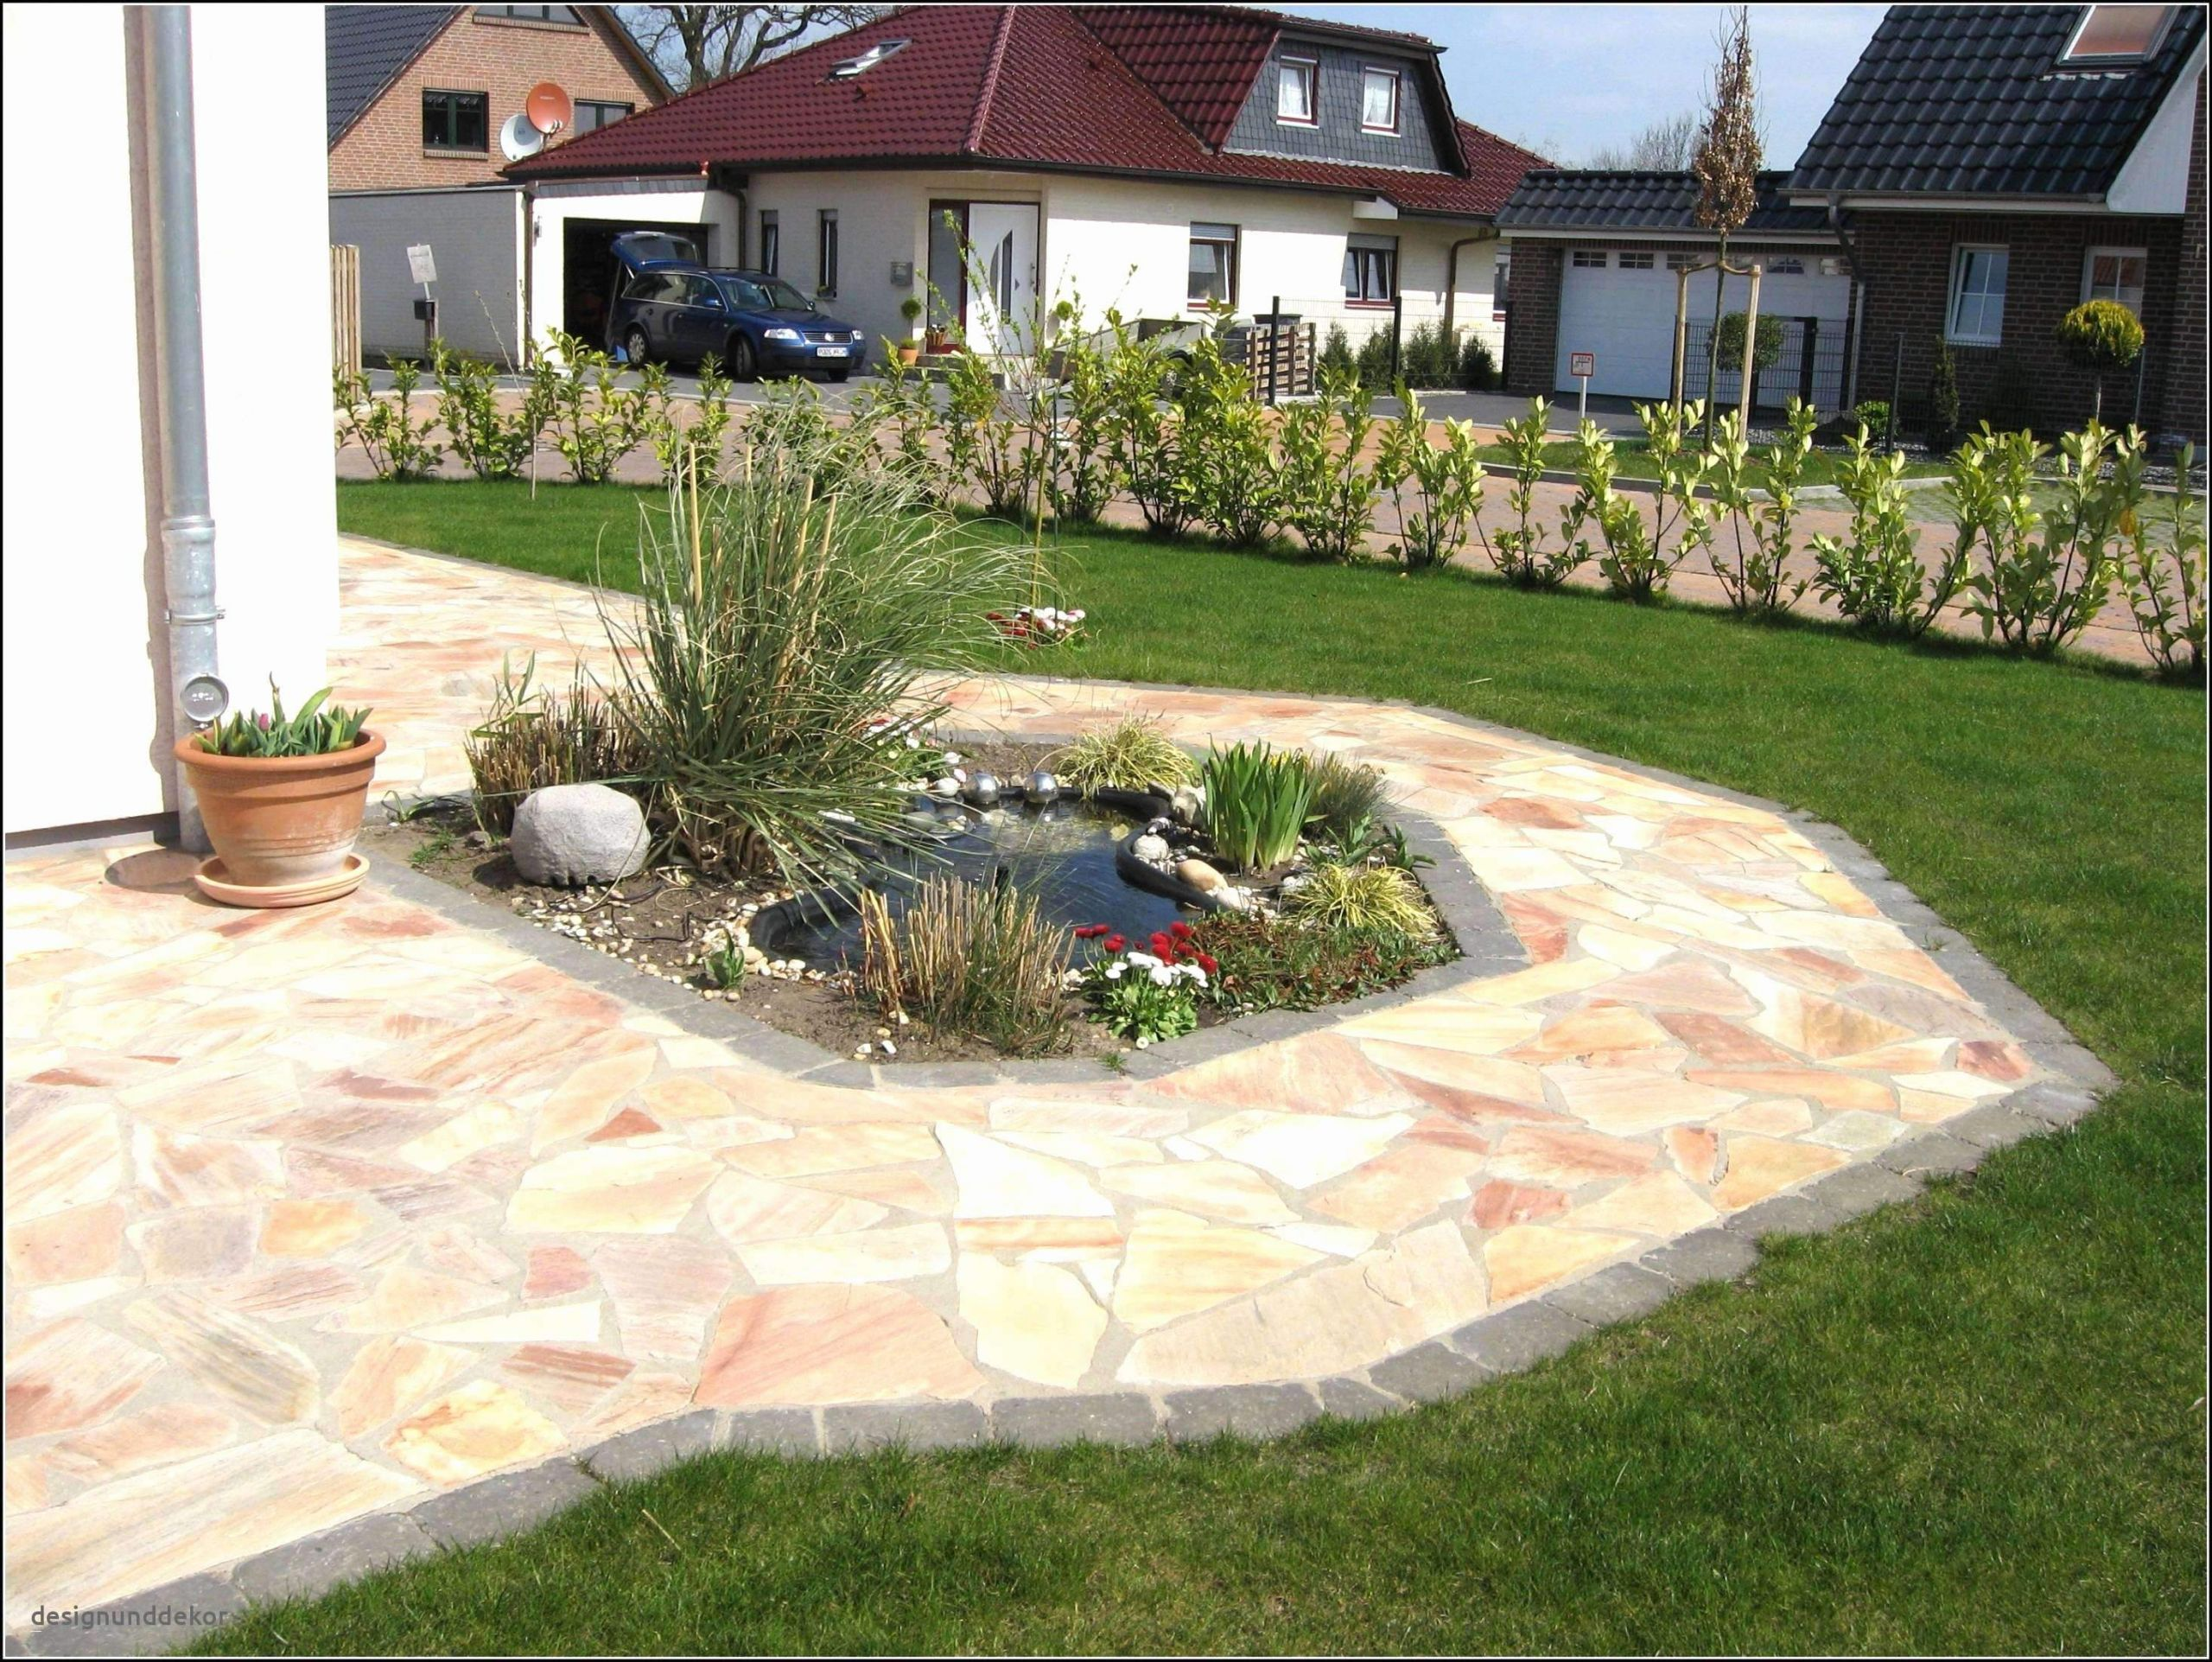 Kunstrasen Für Garten Genial Garten Ideen Selber Bauen